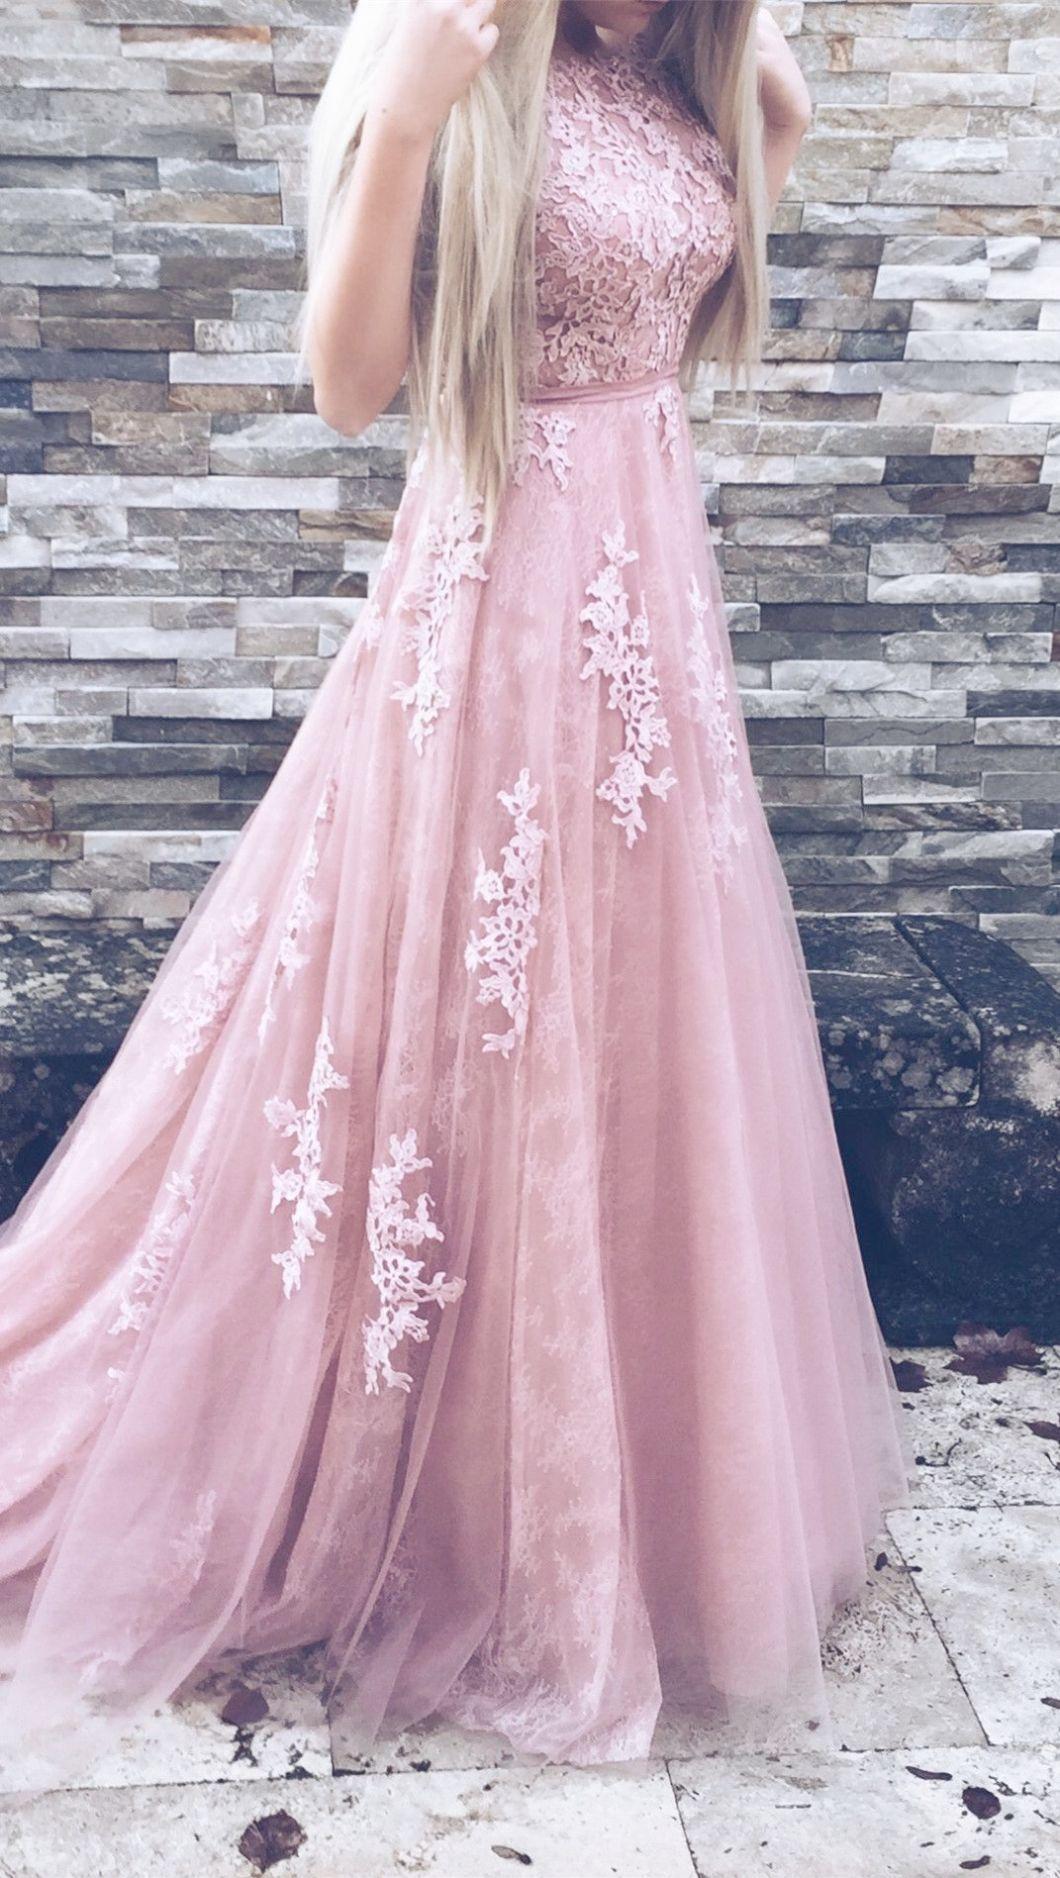 Terrific ueue long homecoming dresses under dollars superb aand